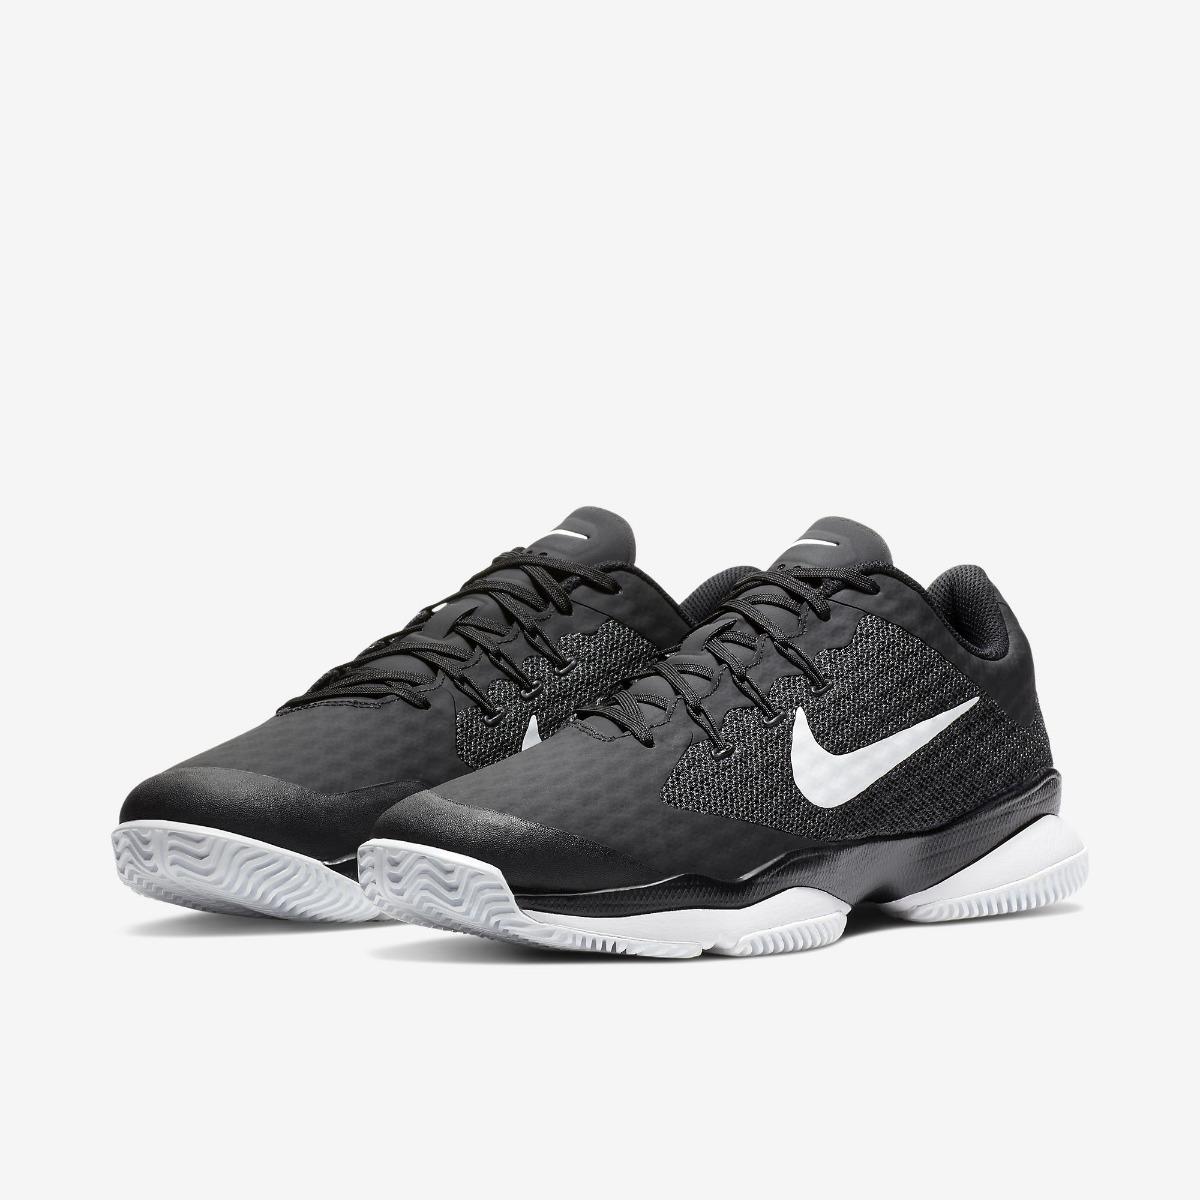 5cee787d17 Tênis Nike Air Zoom Ultra Masculino Tenis